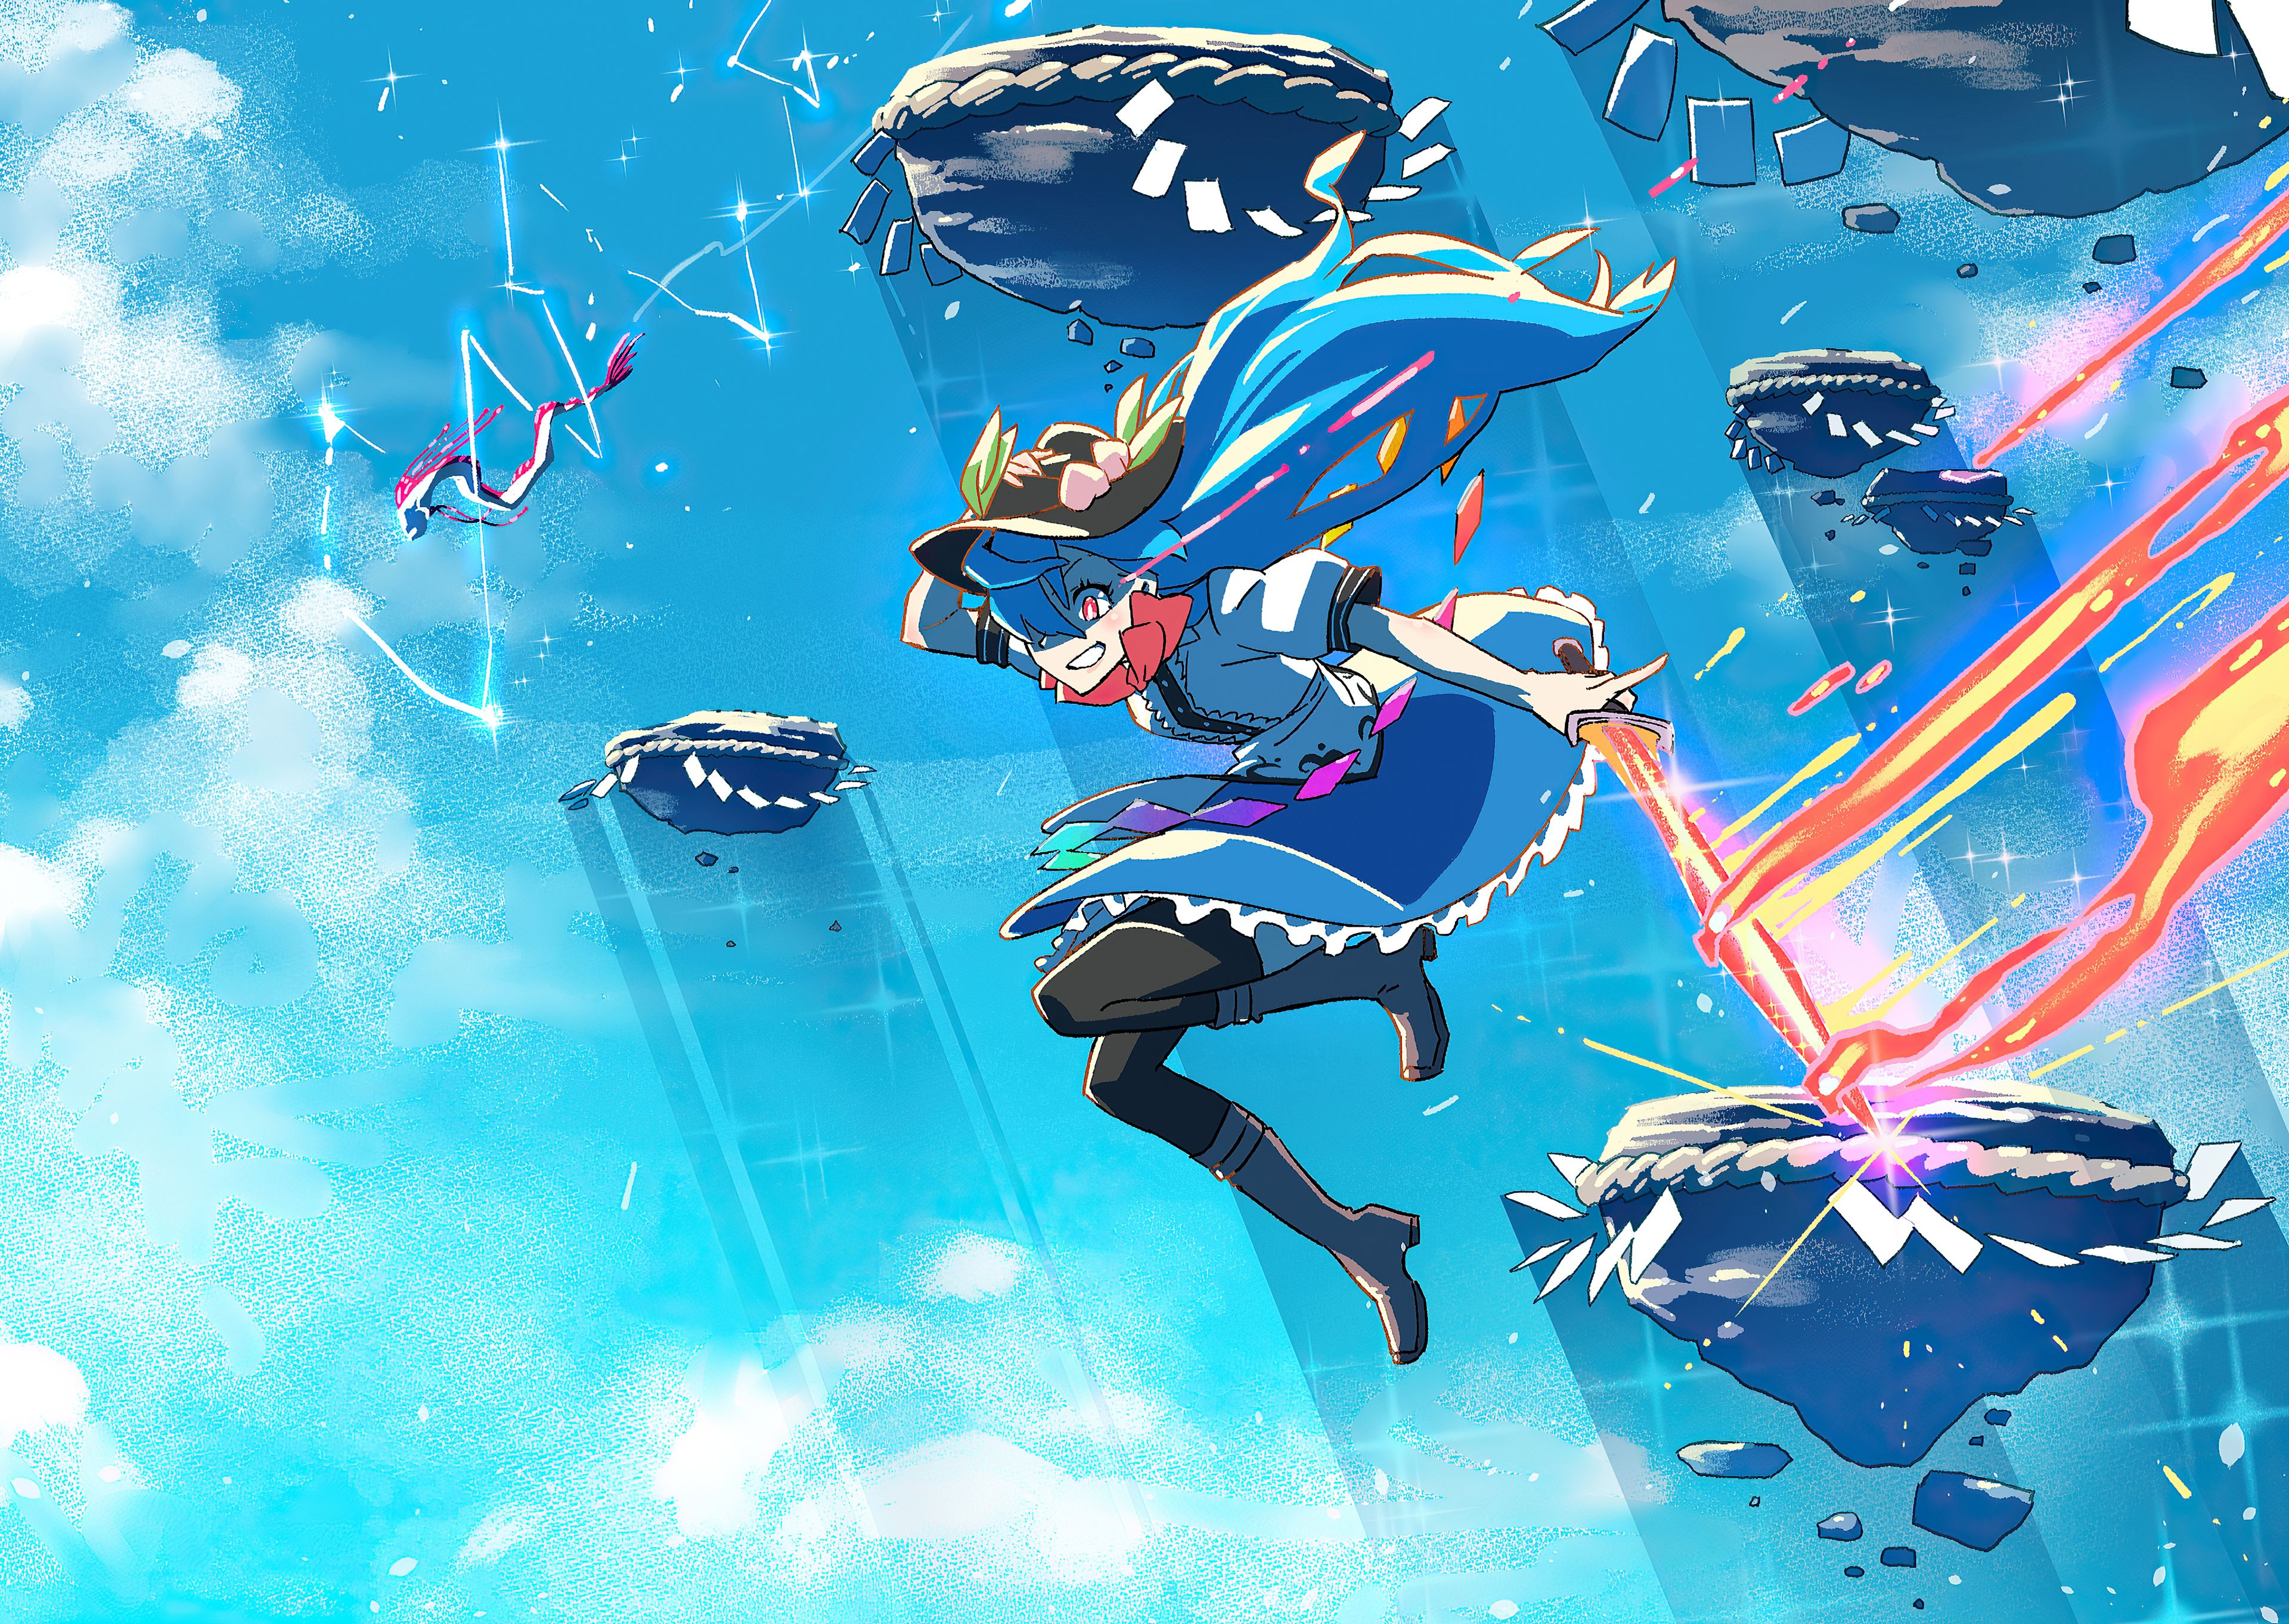 Hinanawi Tenshi Anime 4k Hinanawi Tenshi Anime 4k Wallpapers Anime 4k Anime Wallpapers 4k 4k Anime Wallpaper 25 anime art fantasy wallpapers